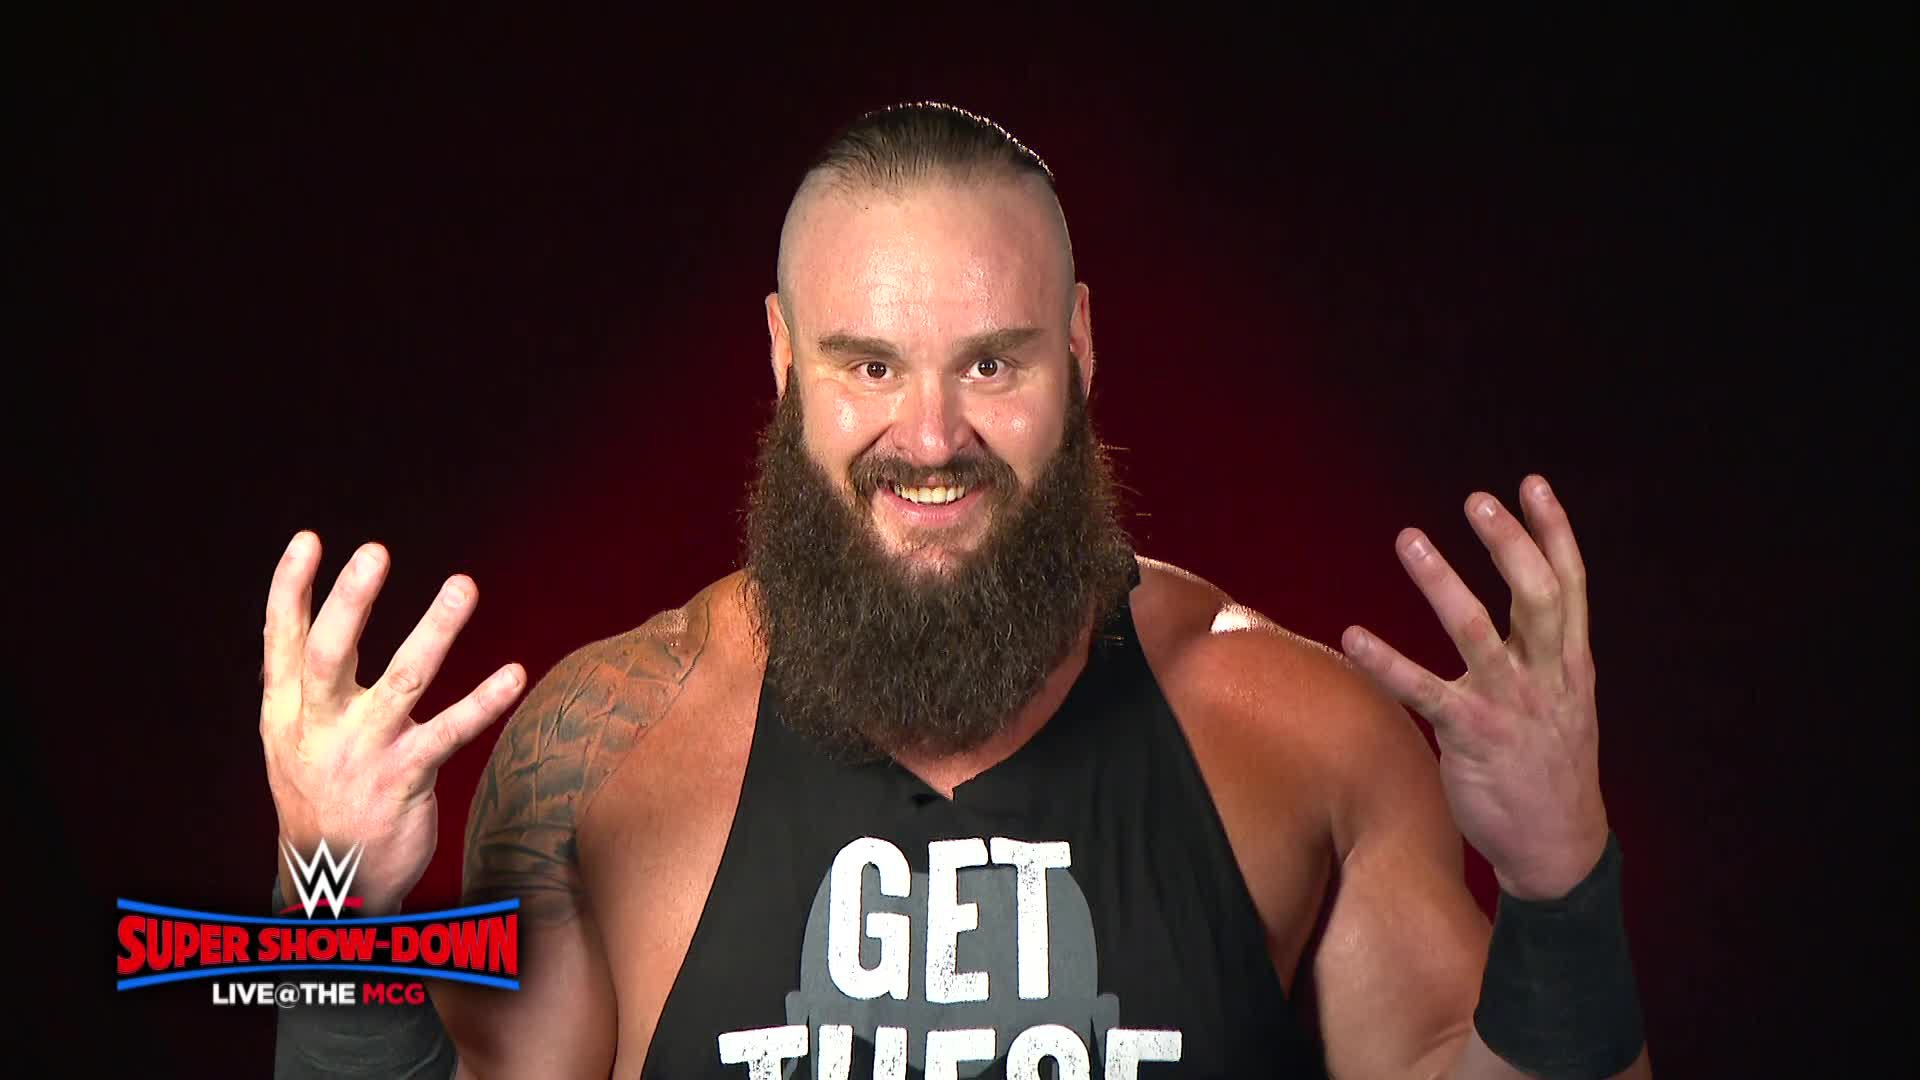 Someone will get Braun Strowman's hands at WWE Super Show-Down